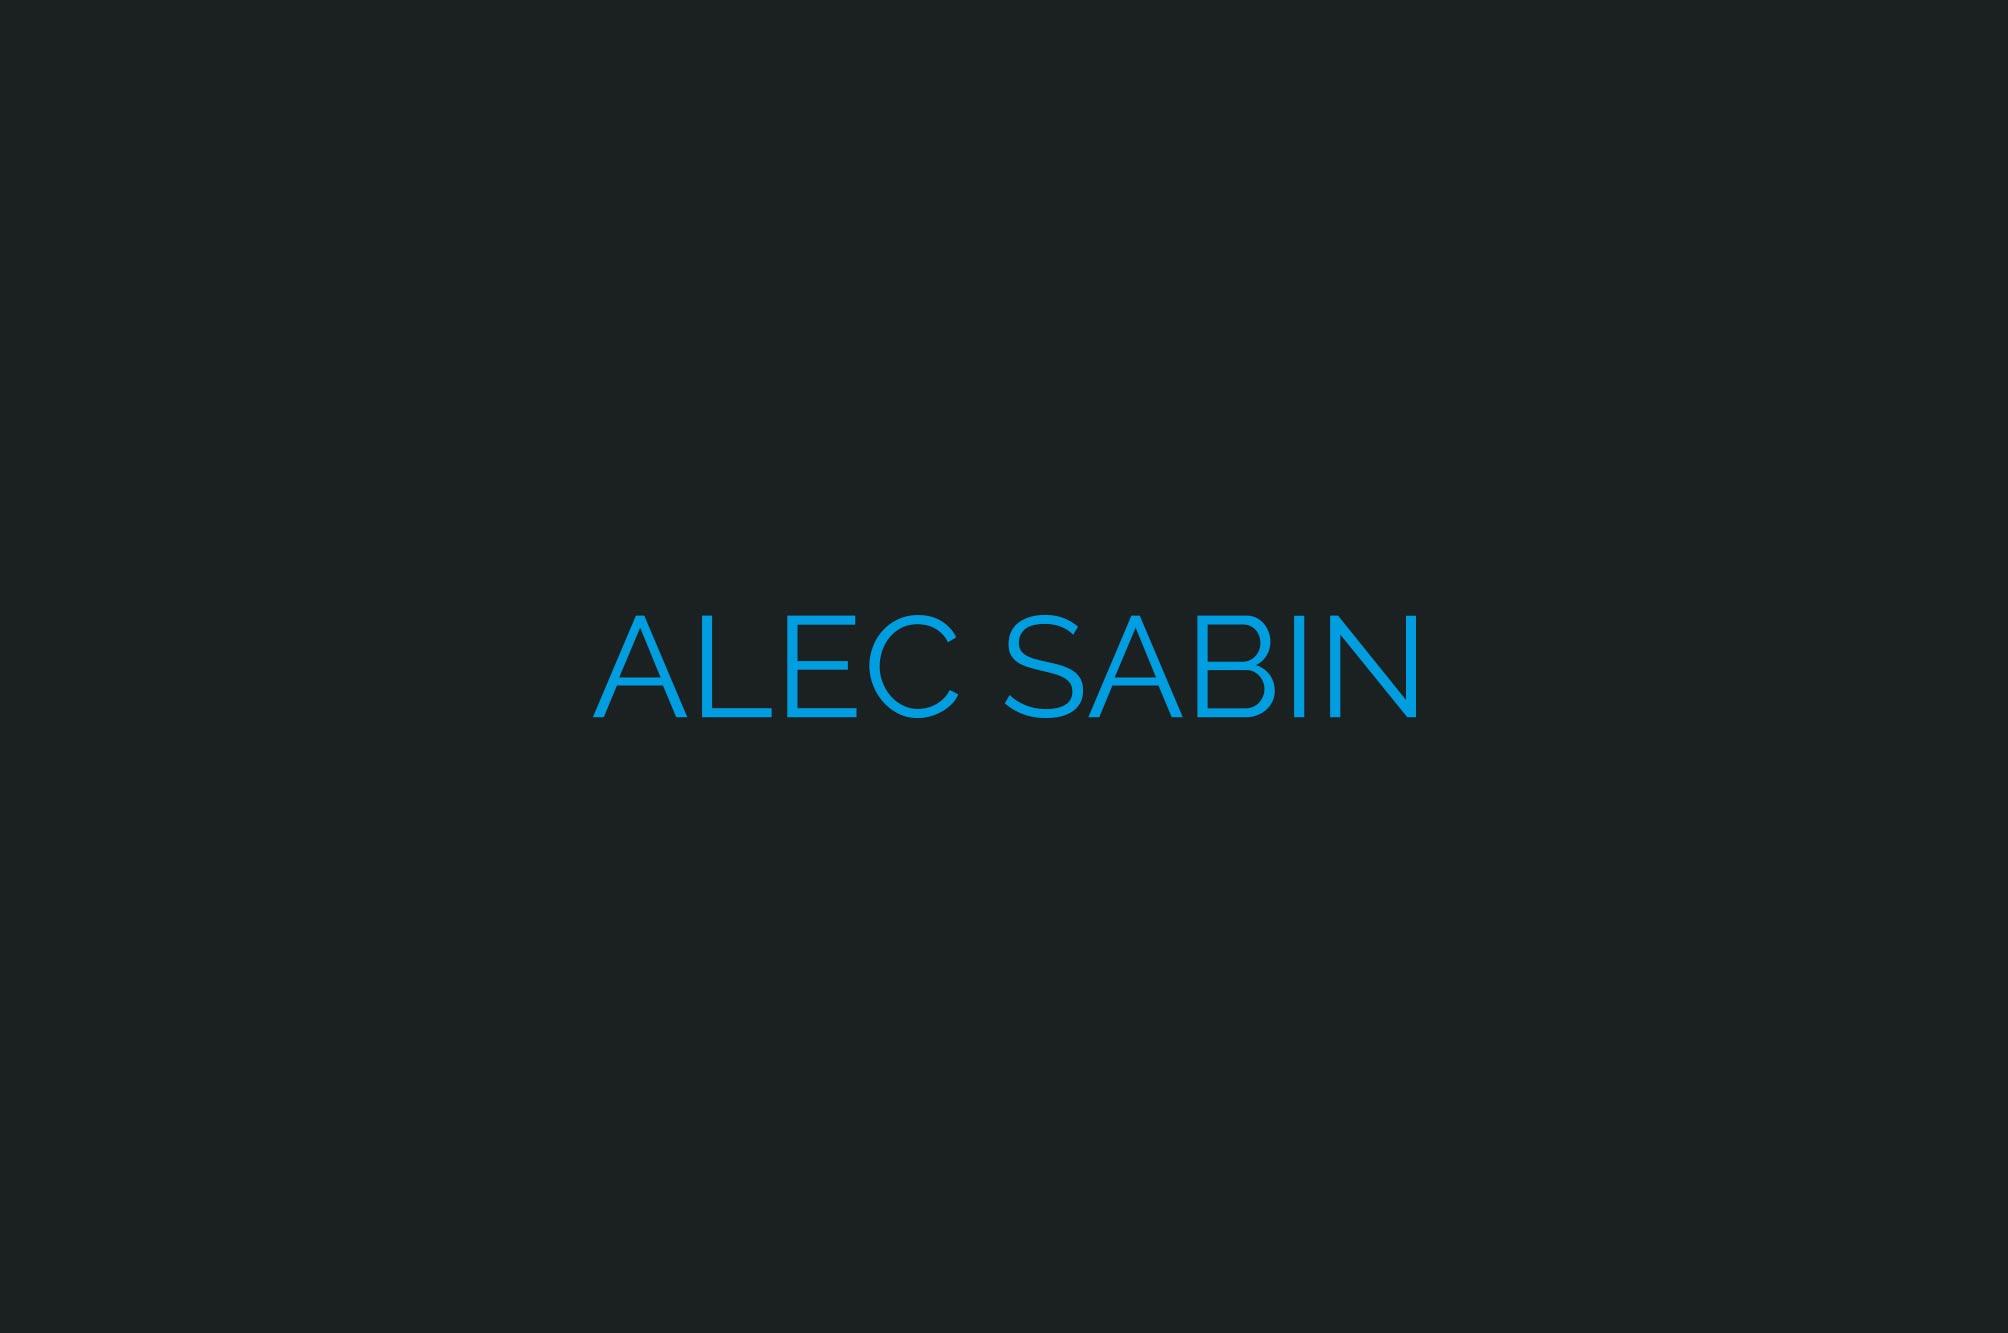 Alec Sabin Logo Blue